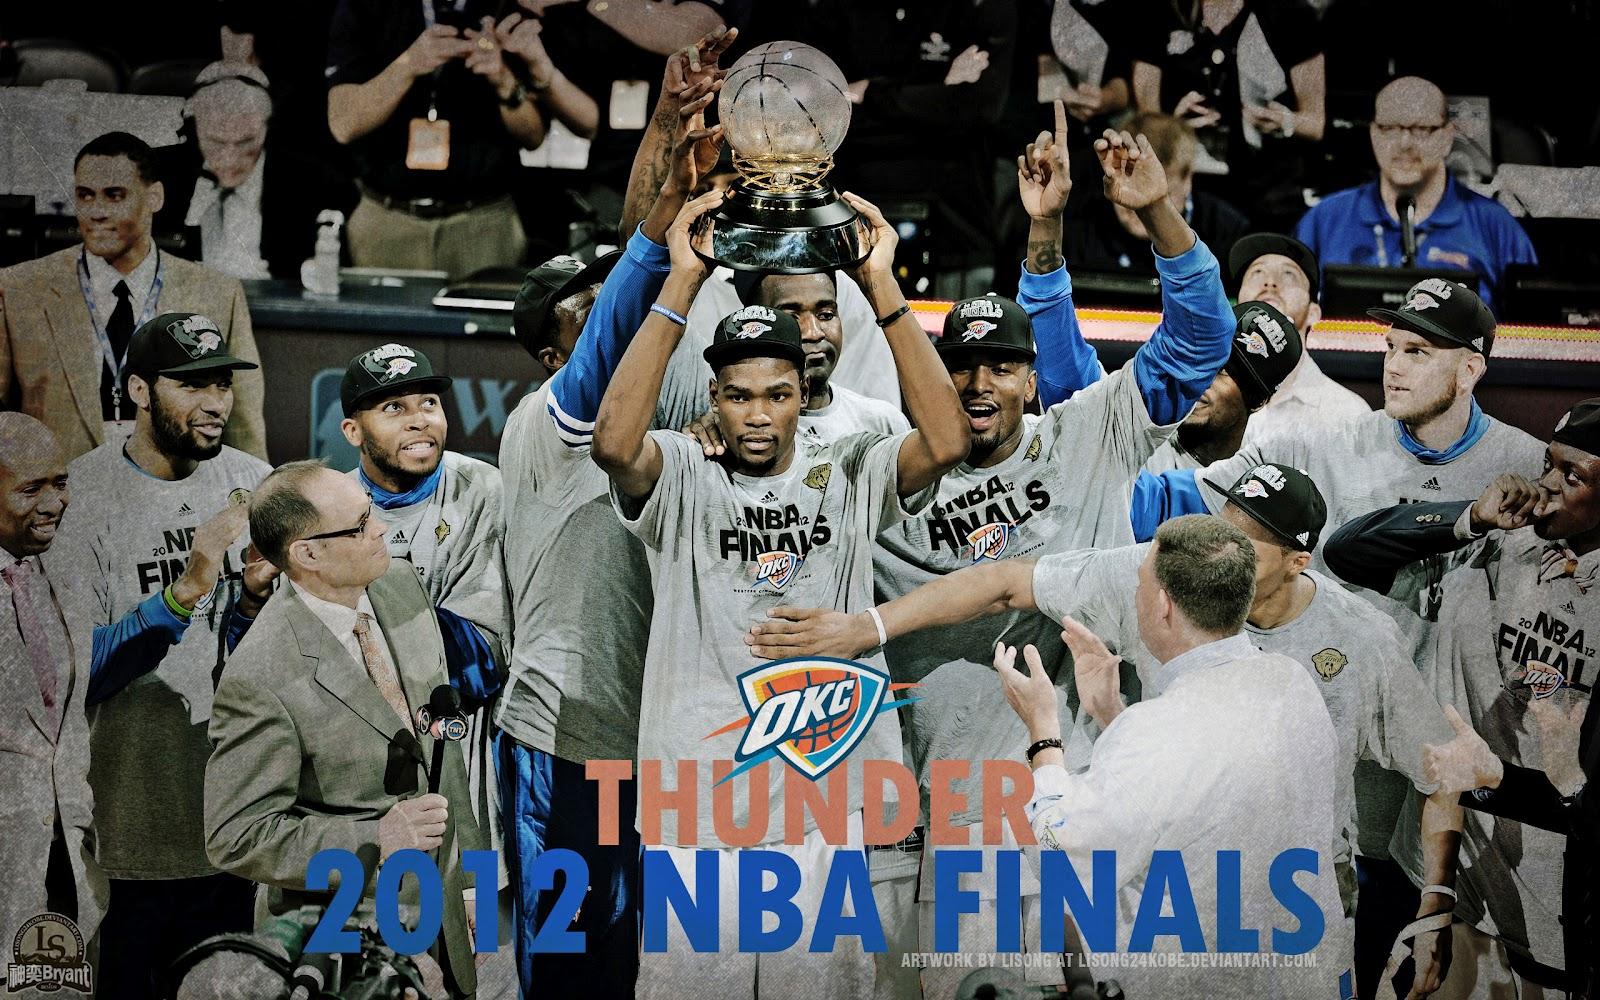 http://3.bp.blogspot.com/-y77e6OXm2N4/T9Hz2lJlKTI/AAAAAAAASAM/oaYvR6CPj98/s1600/OKC-Thunder-2012-NBA-West-Champions-2560x1600-Wallpaper-BasketWallpapers.com-.jpg